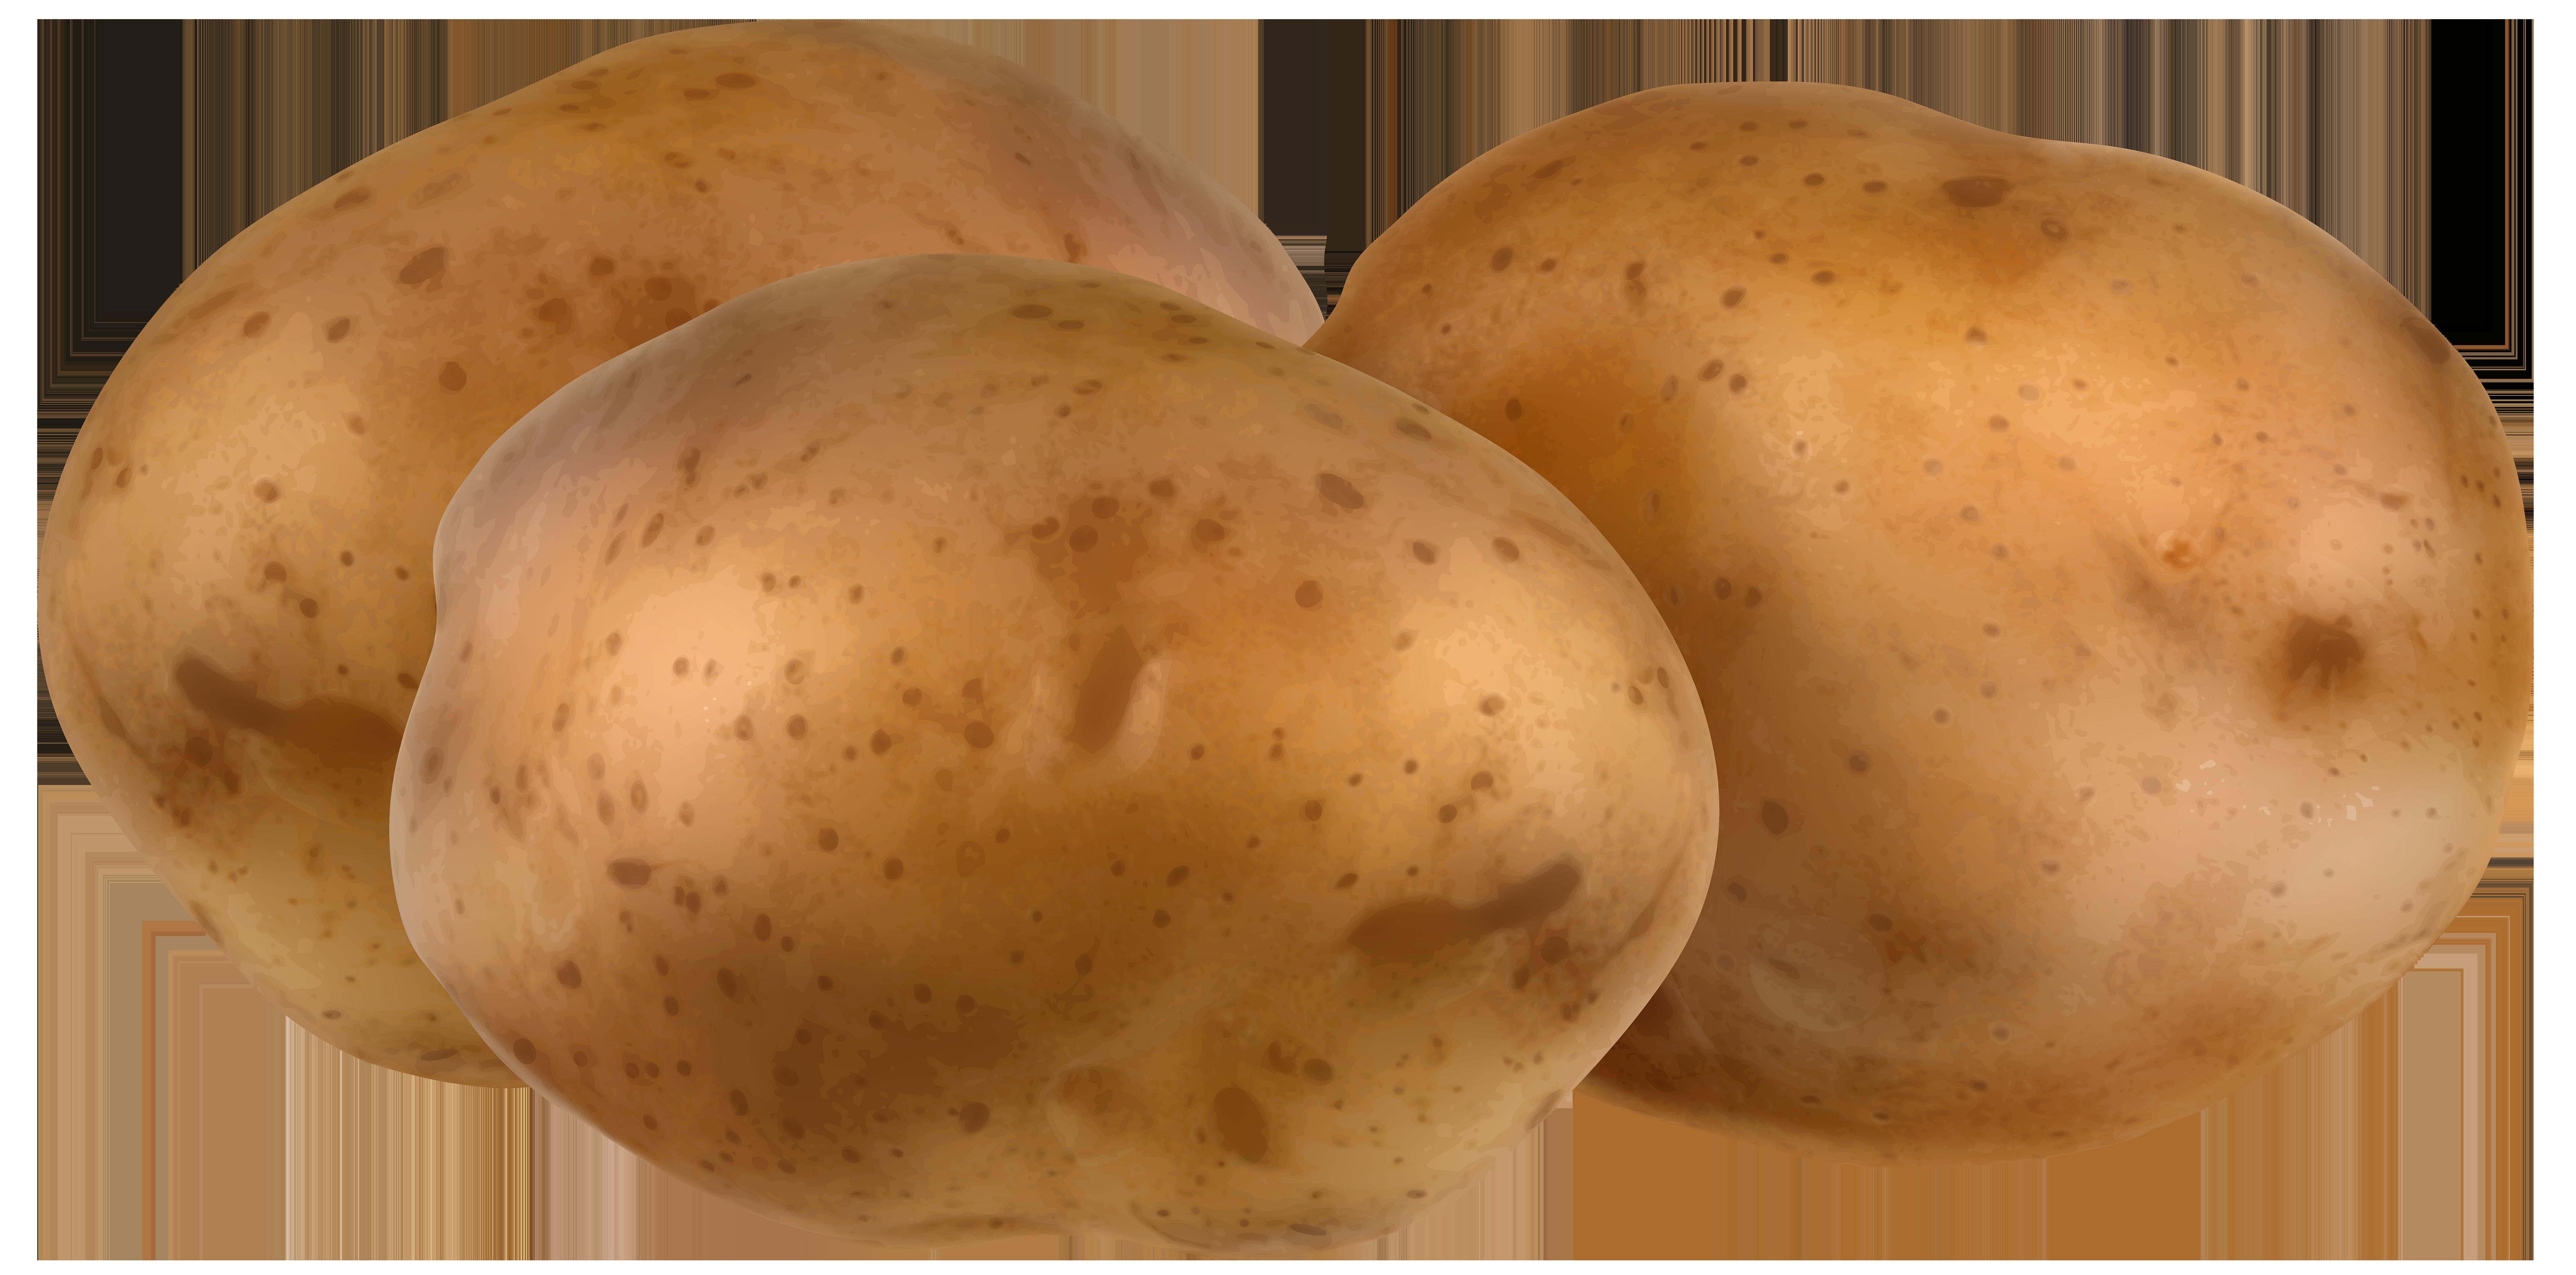 Potato clipart. Potatoes transparent png clip